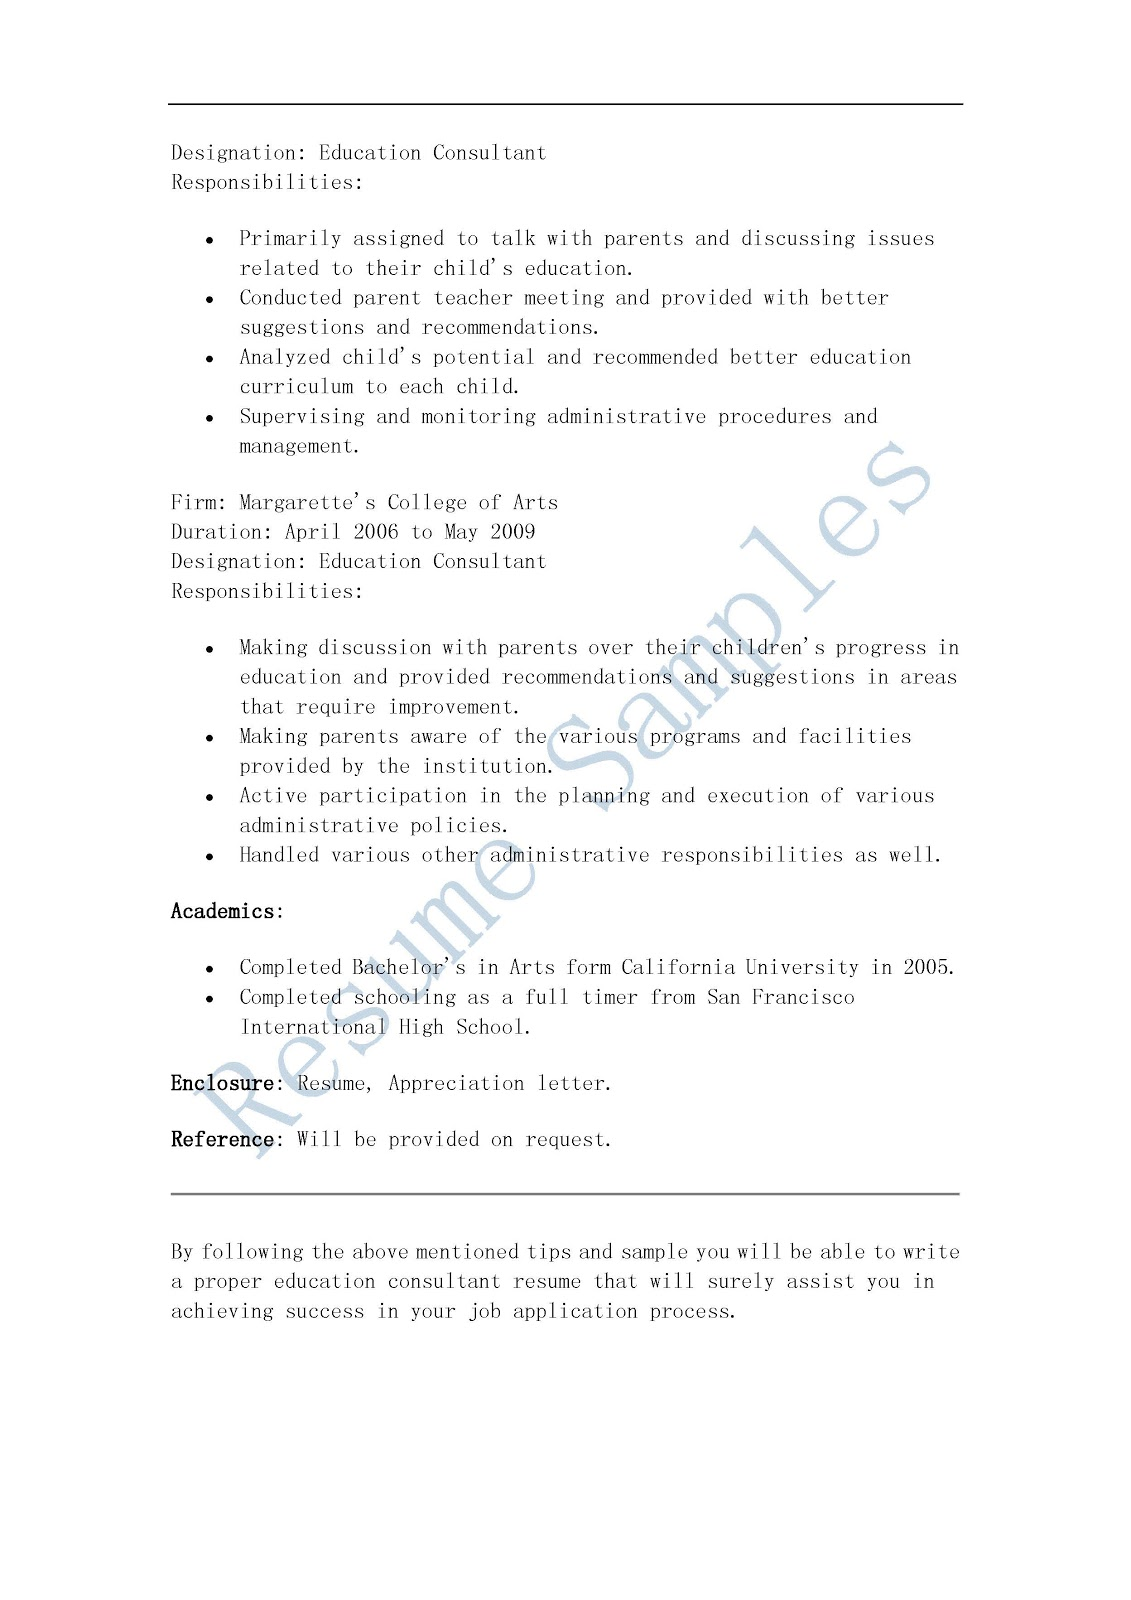 resume samples  education consultant resume